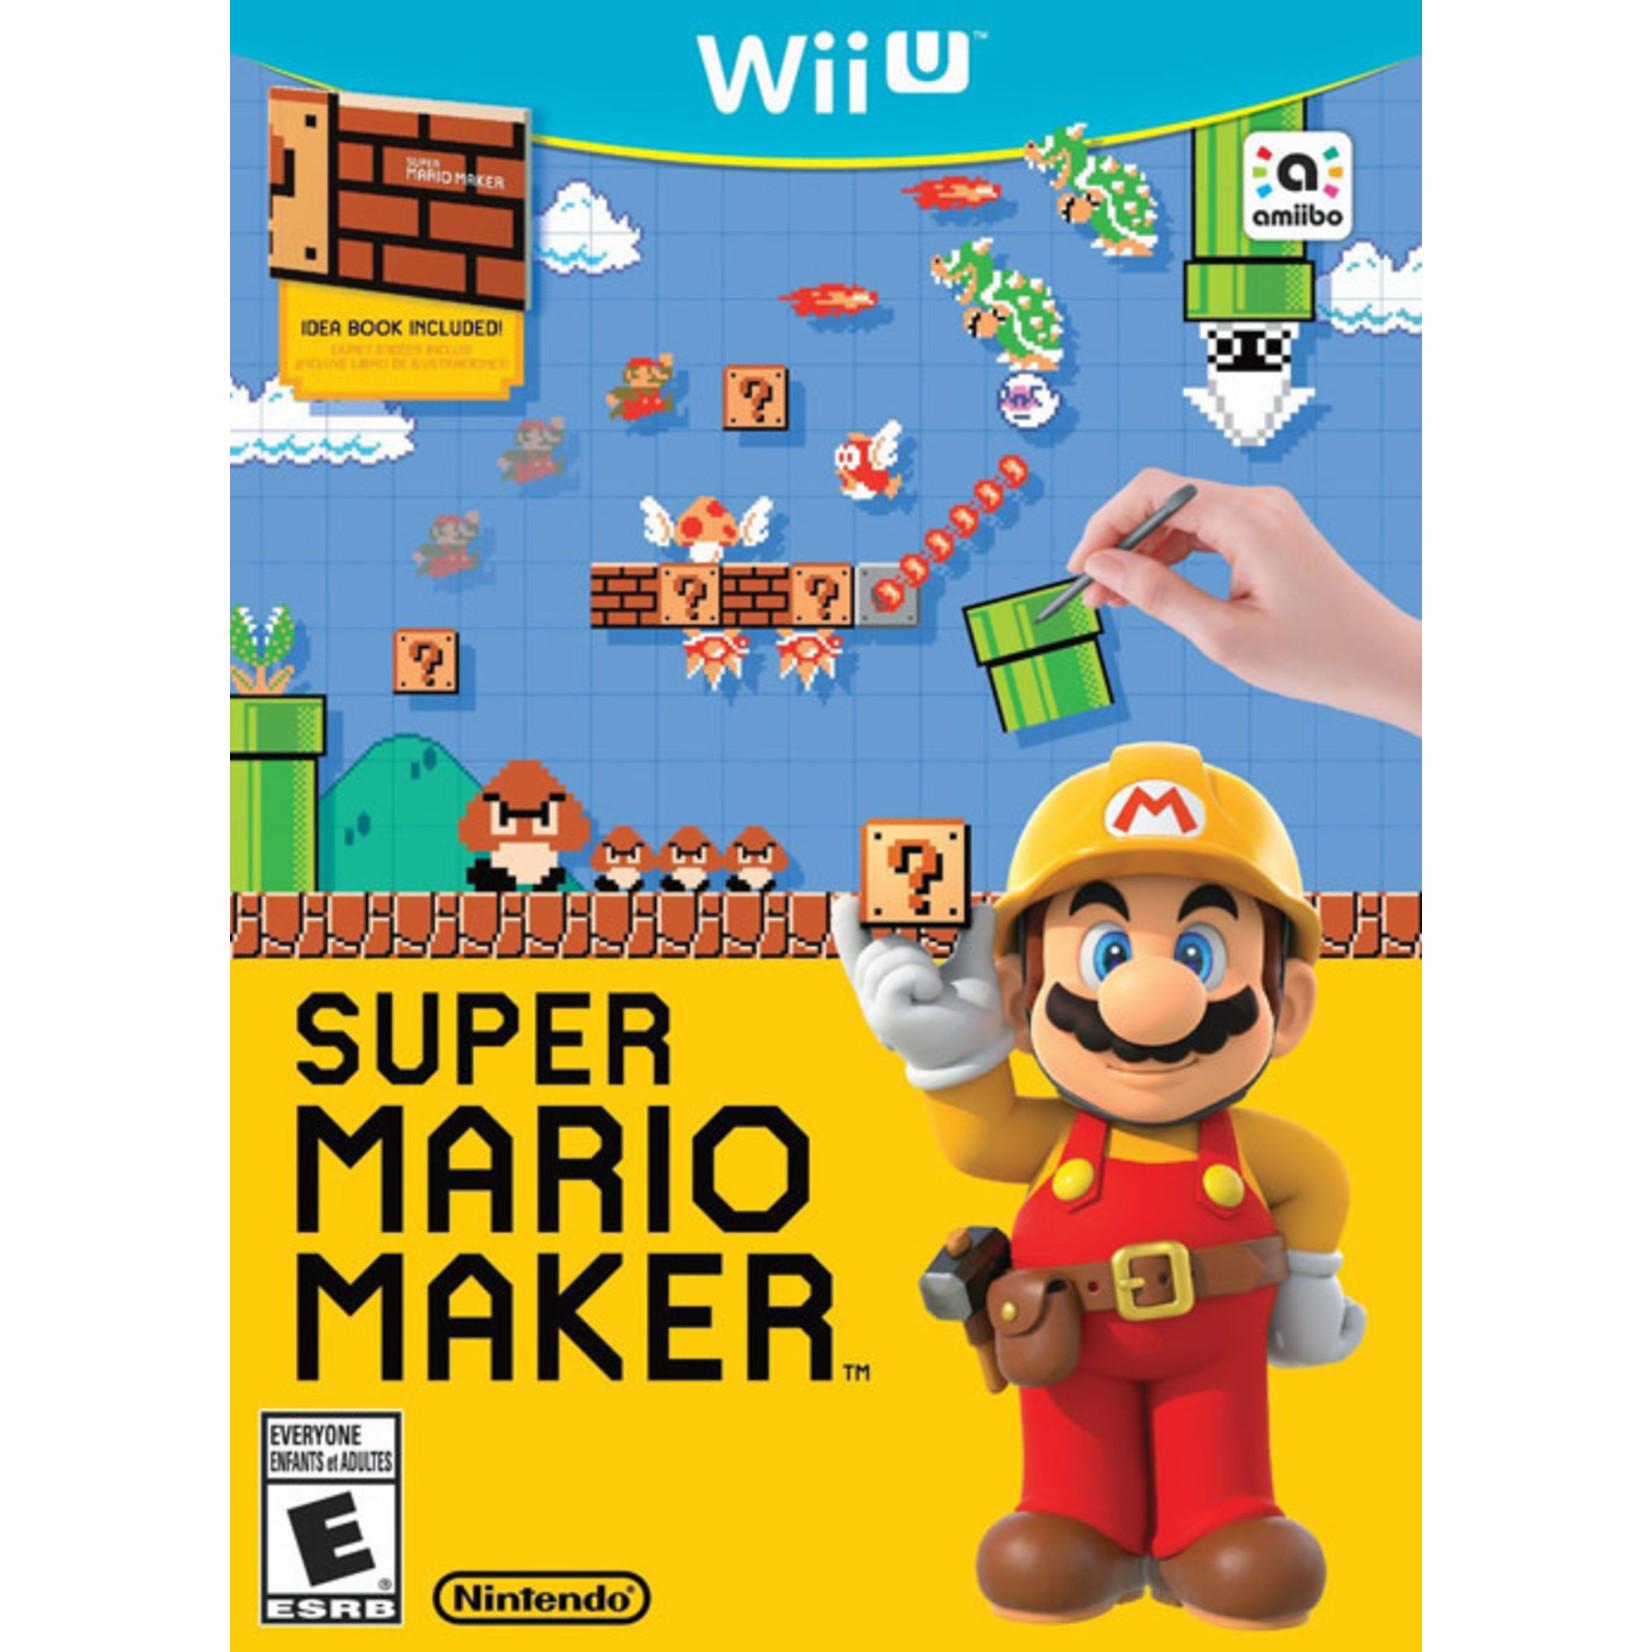 WIIUUSD-Super Mario Maker